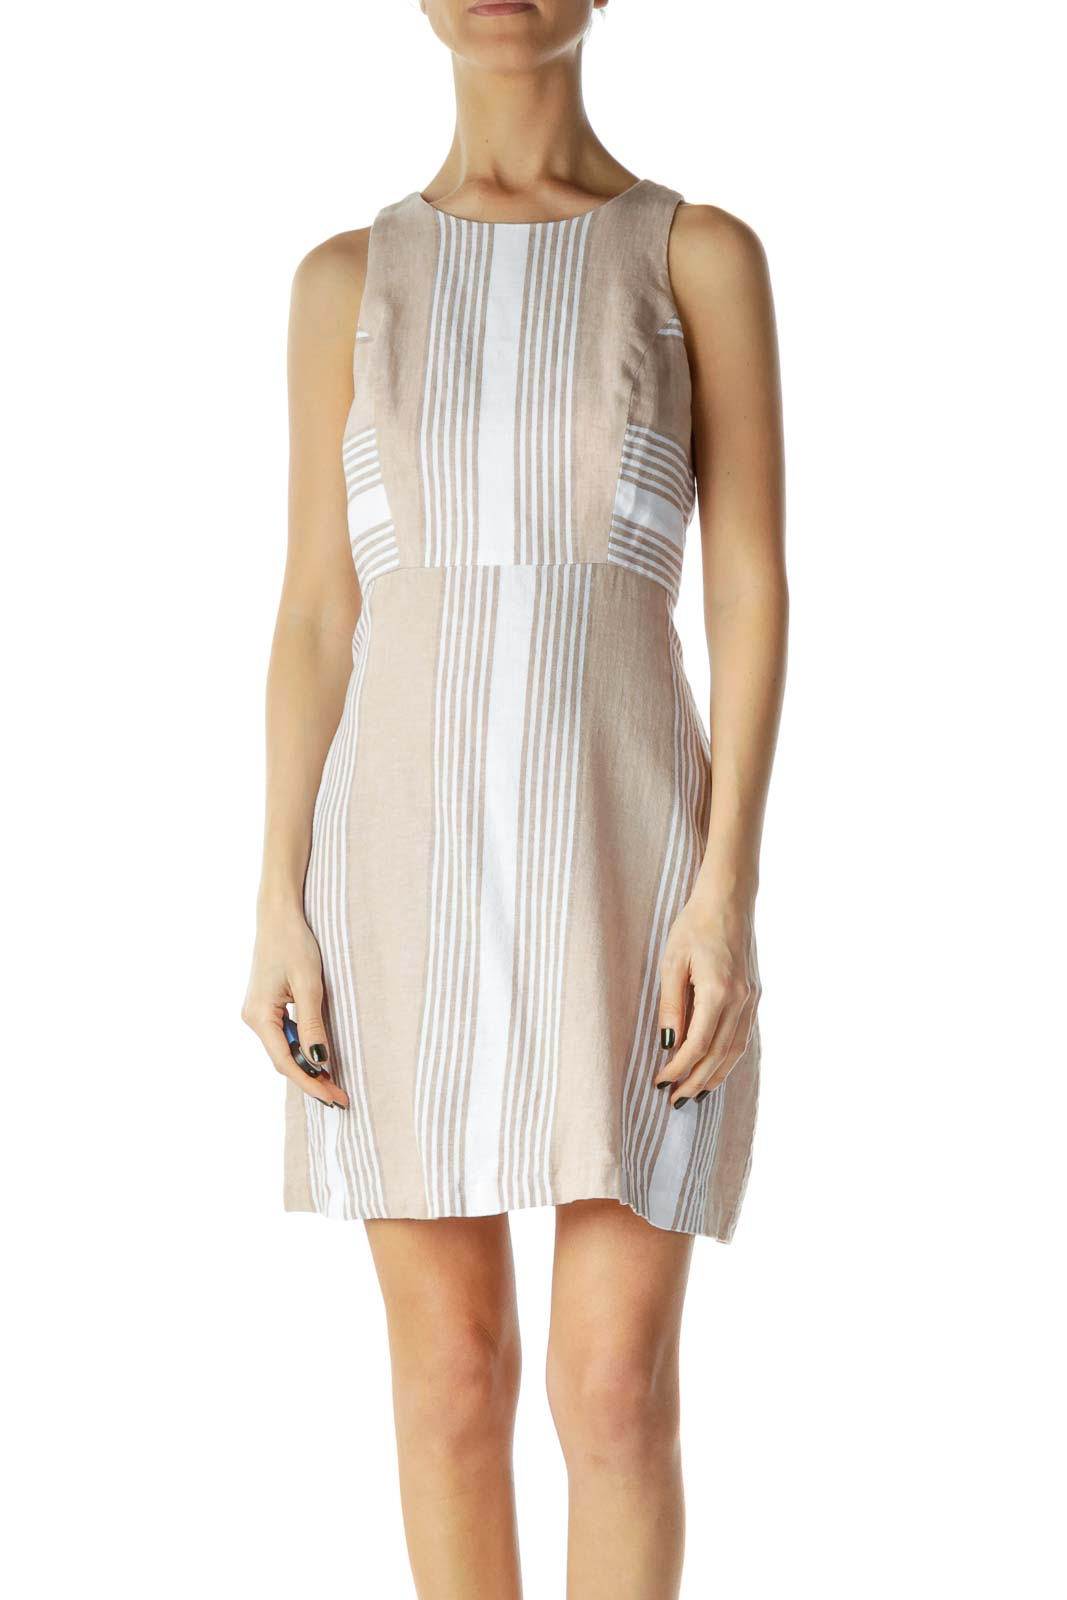 Beige White Linen Striped Day Dress